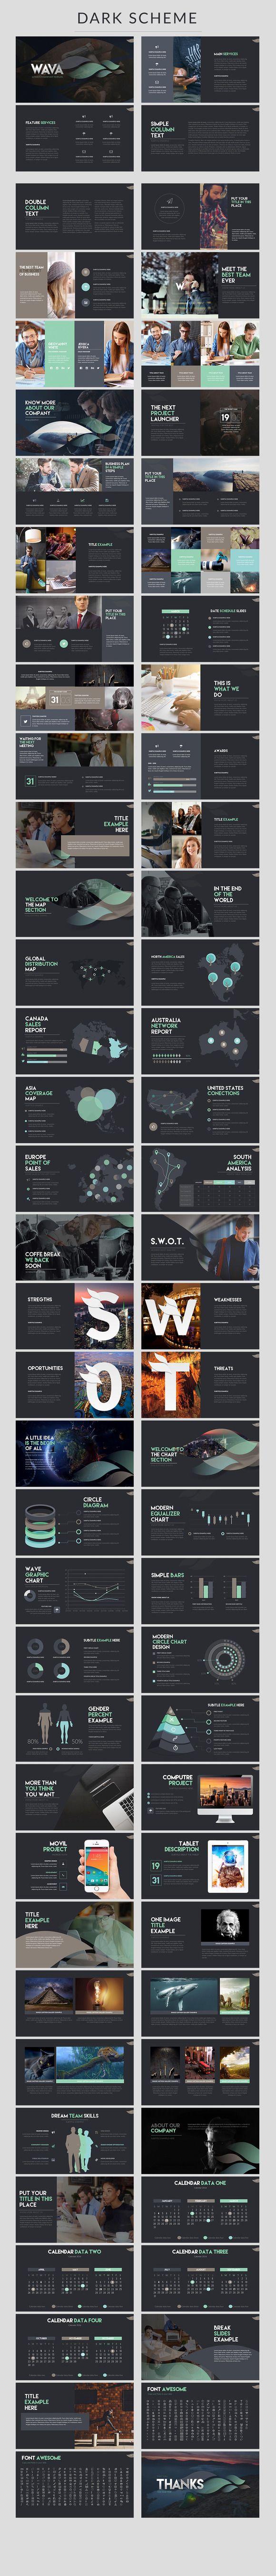 Wava | Powerpoint template + Bonus - Presentations - 8